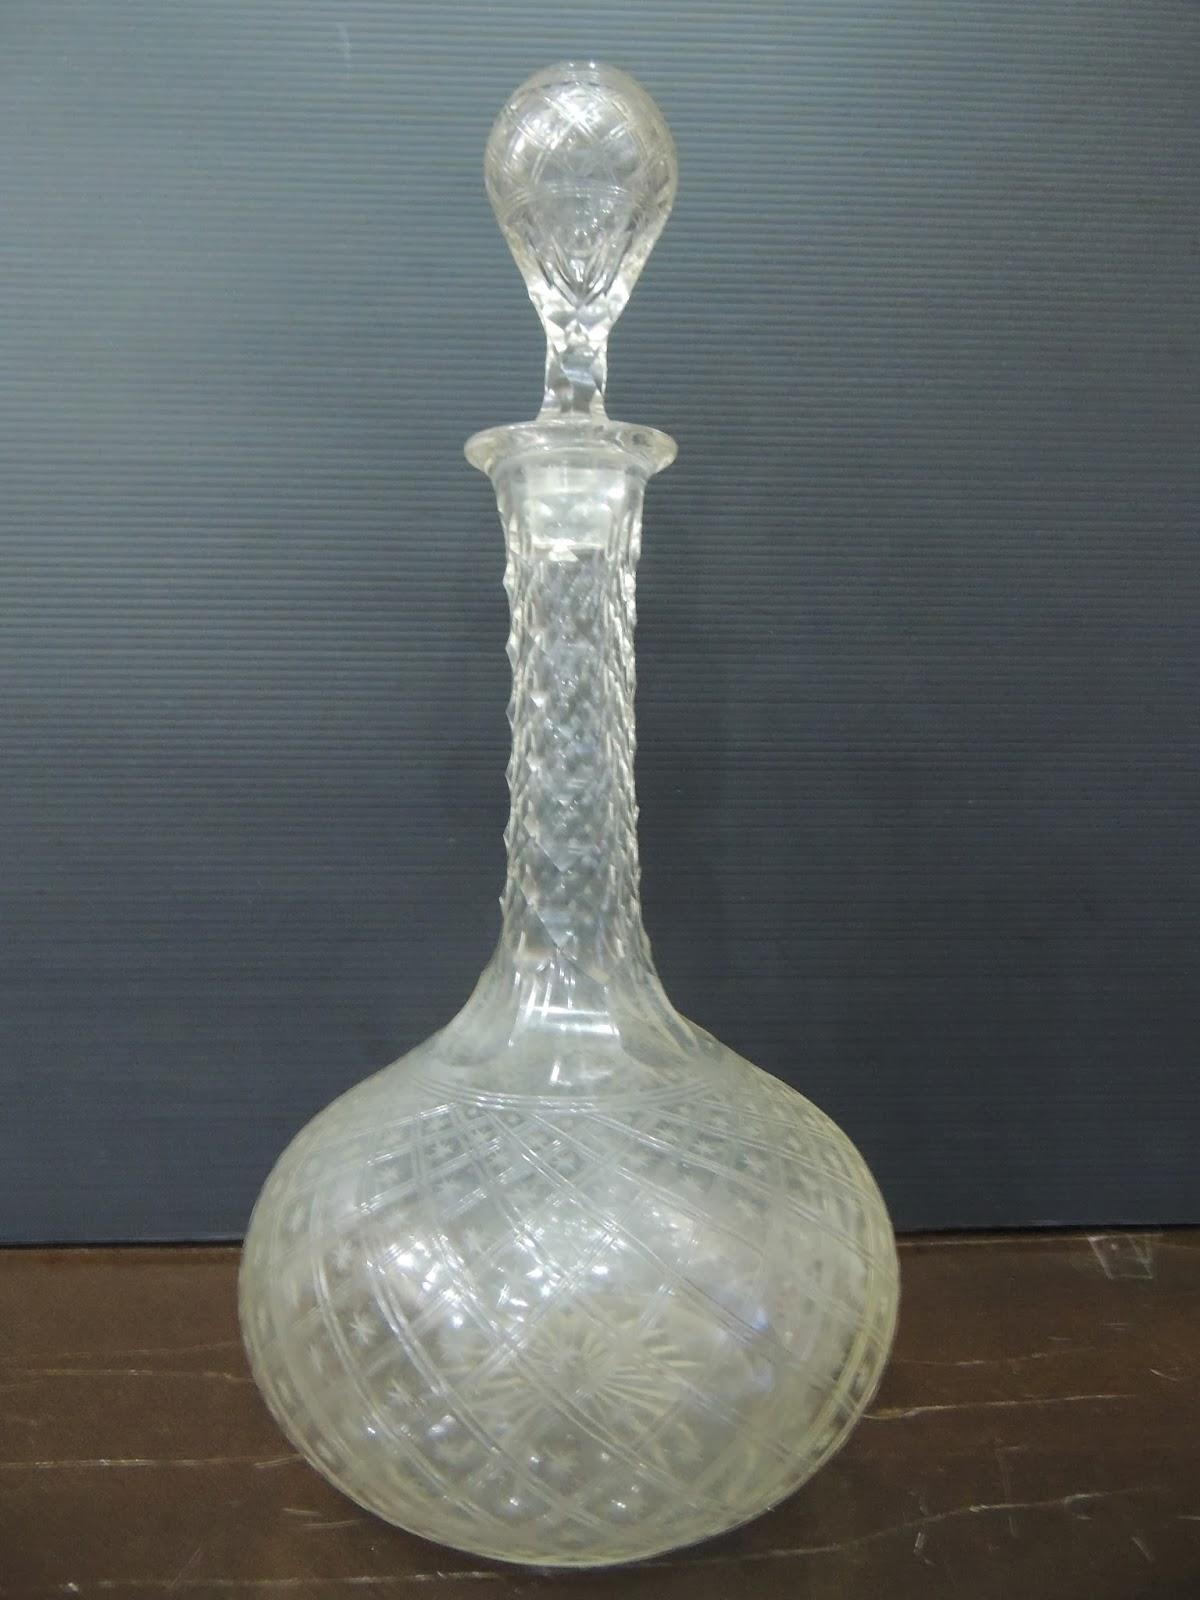 k florence antique glass - photo#29